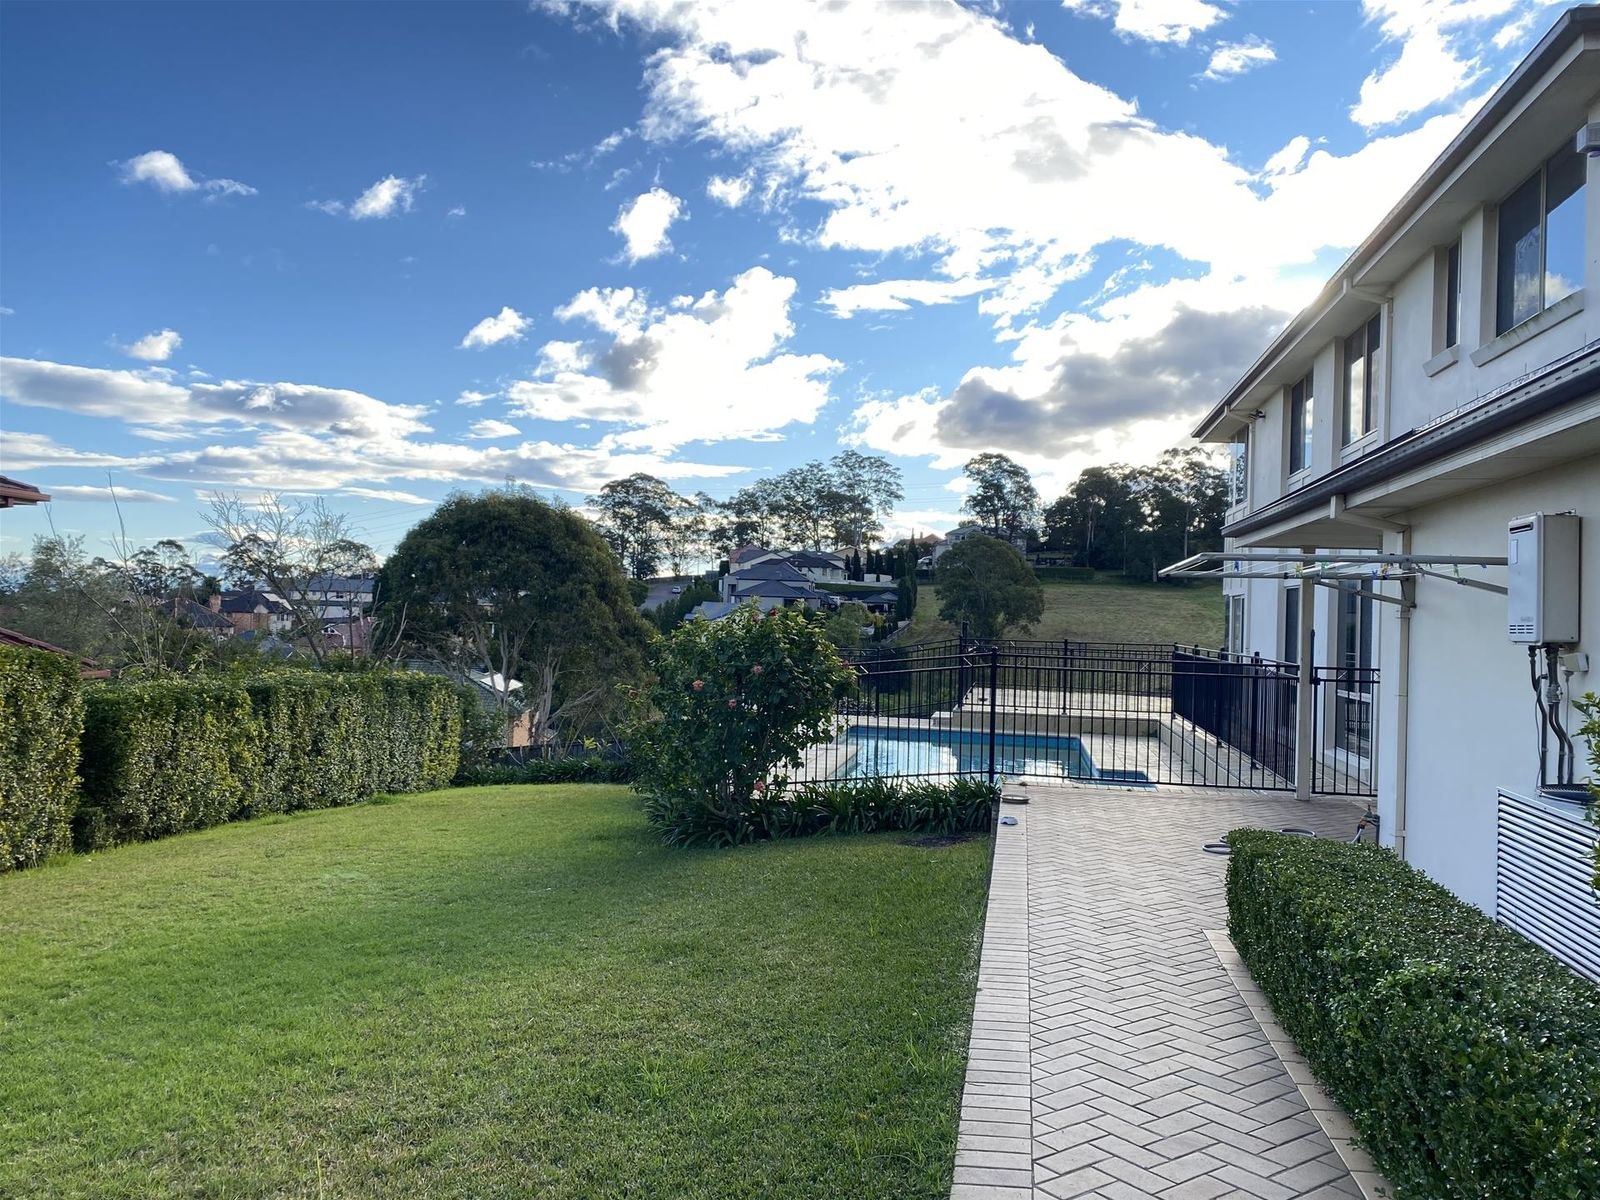 102 Coonara Avenue, West Pennant Hills, NSW 2125